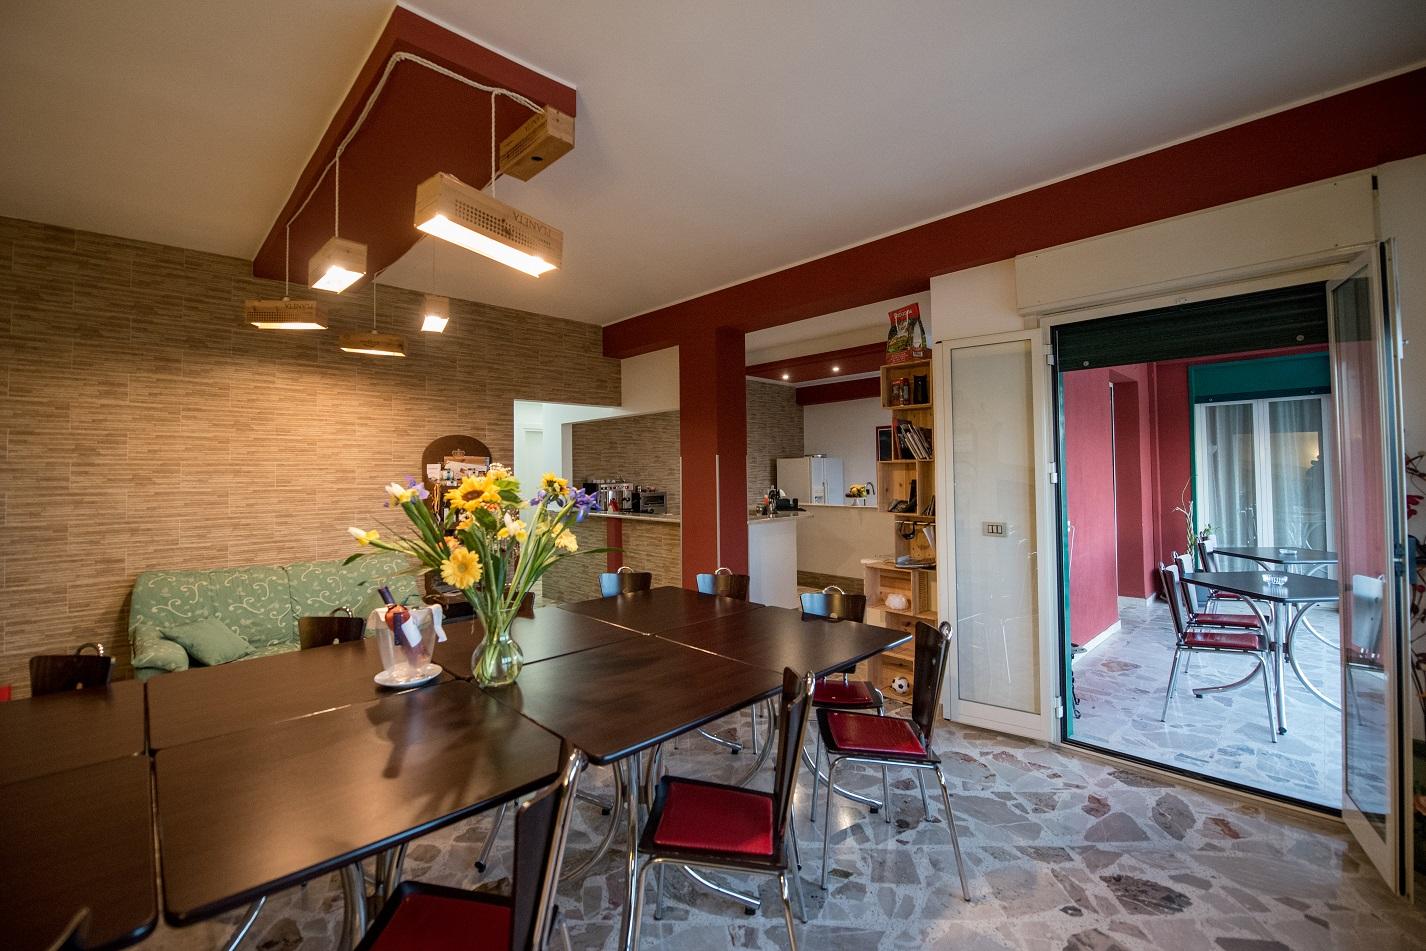 Holiday apartment Camagna Country House - in der sizilianischen Landschaft eingetaucht (2420806), Partanna, Trapani, Sicily, Italy, picture 9